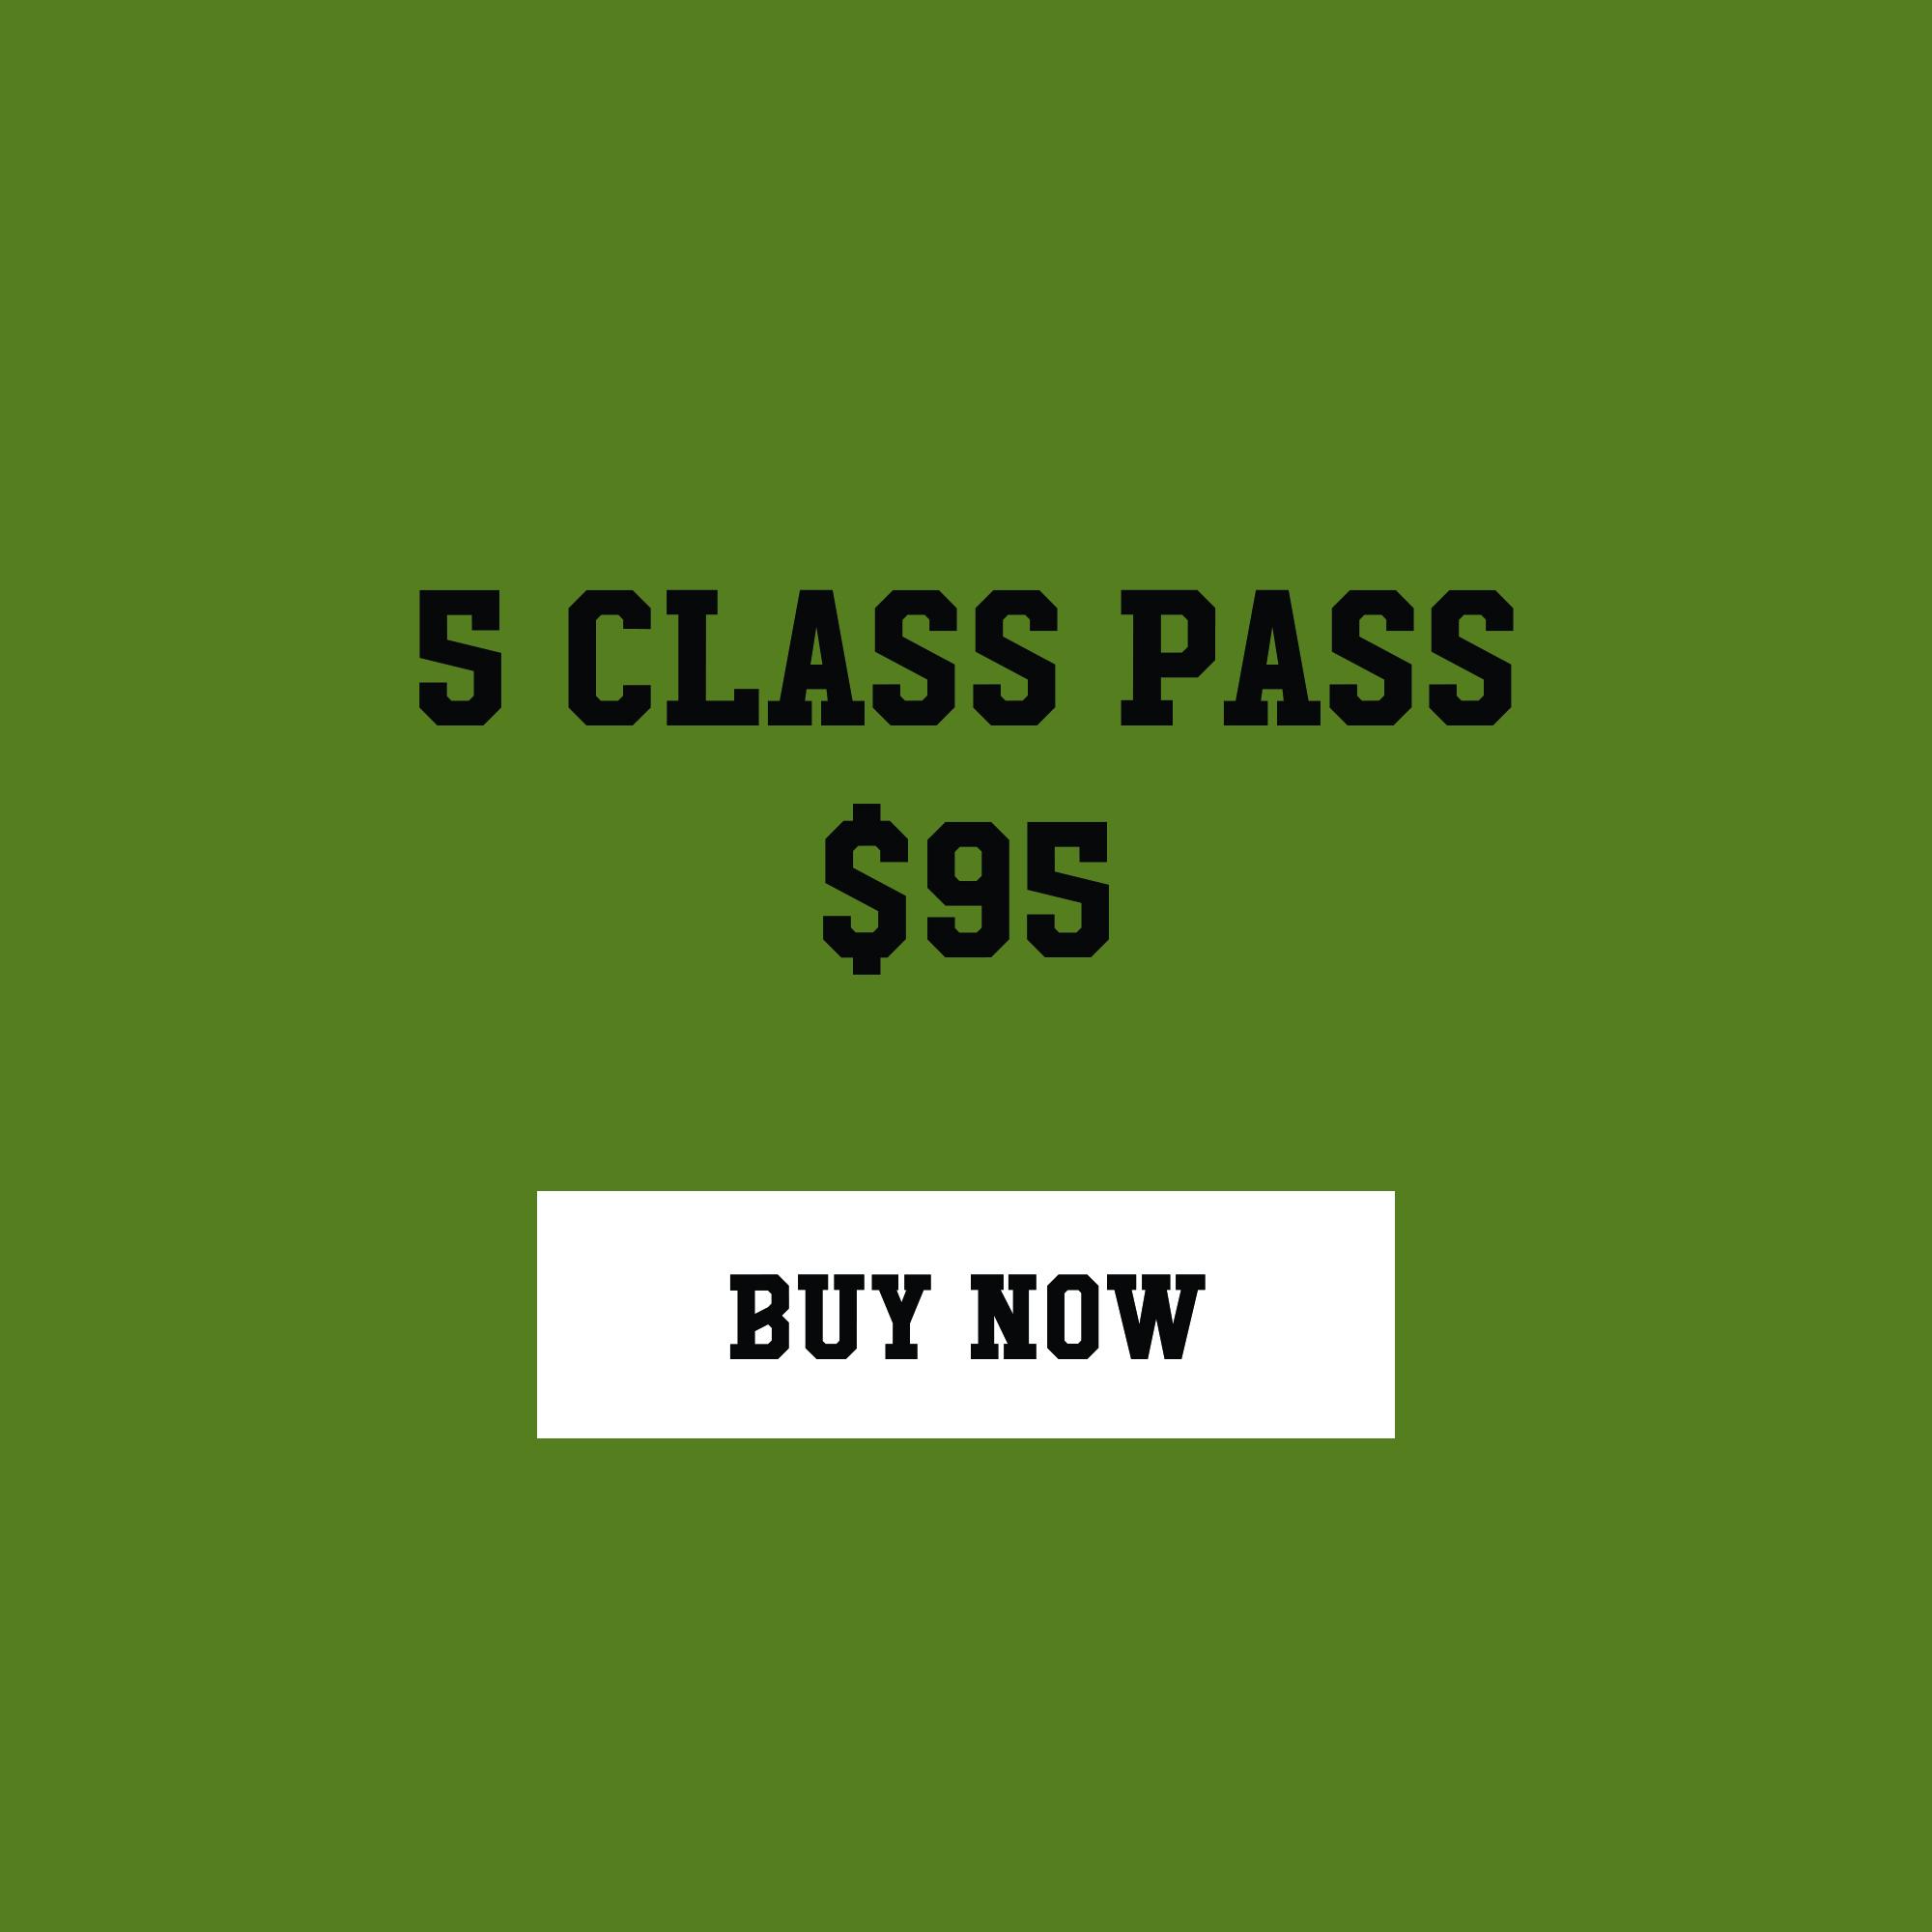 ($19 a class) Expires in twelve months